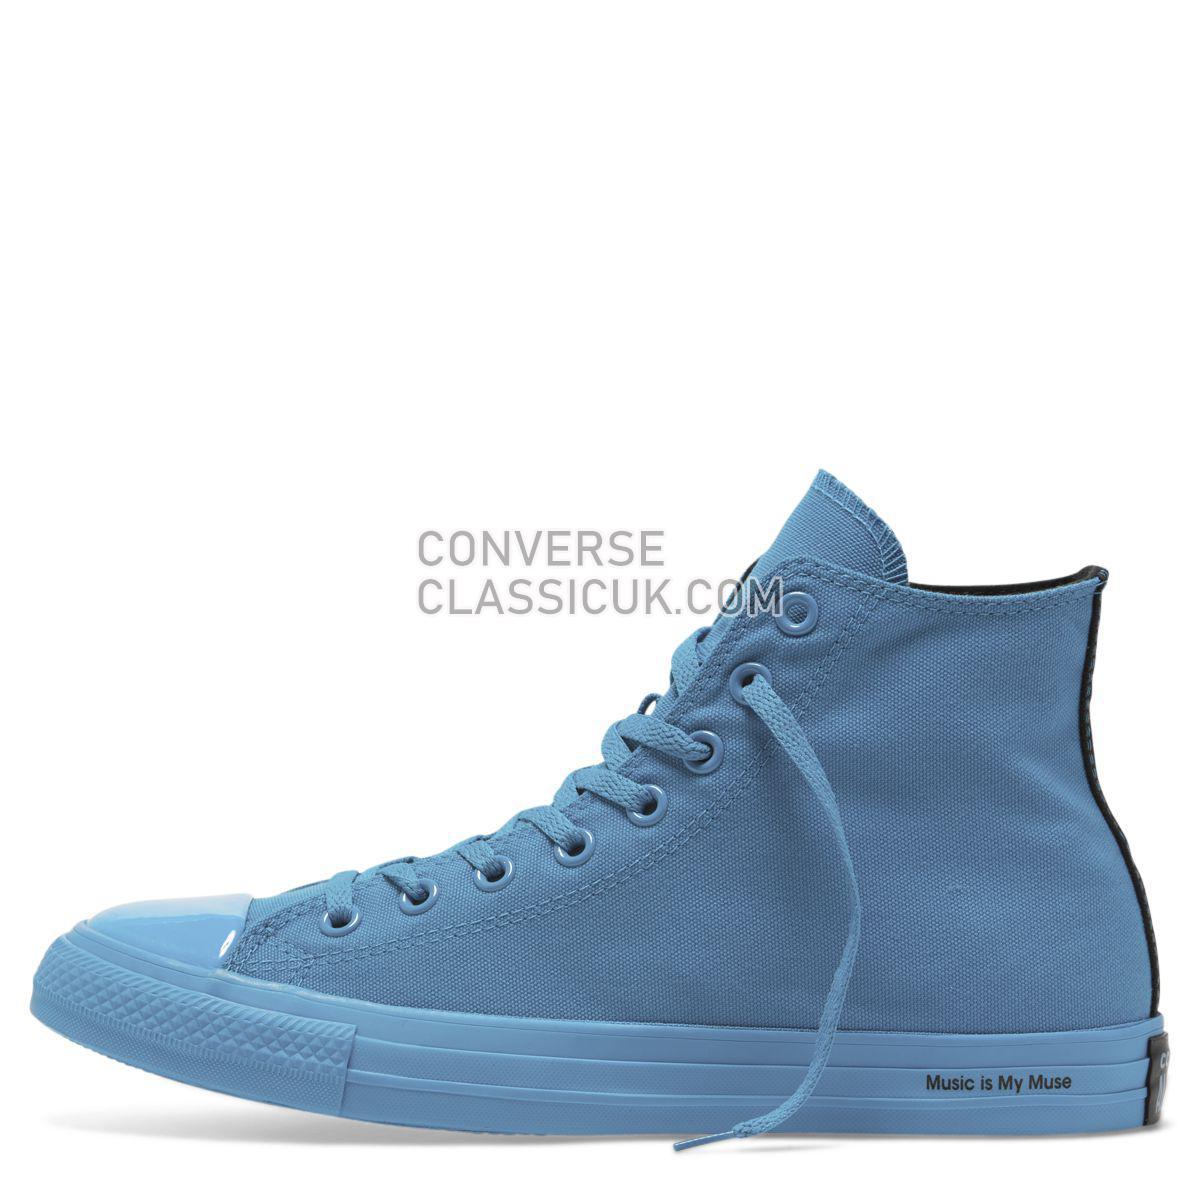 Converse X OPI Chuck Taylor All Star High Top Cyan Space Womens 165659 Cyan Space/Black/Cyan Space Shoes